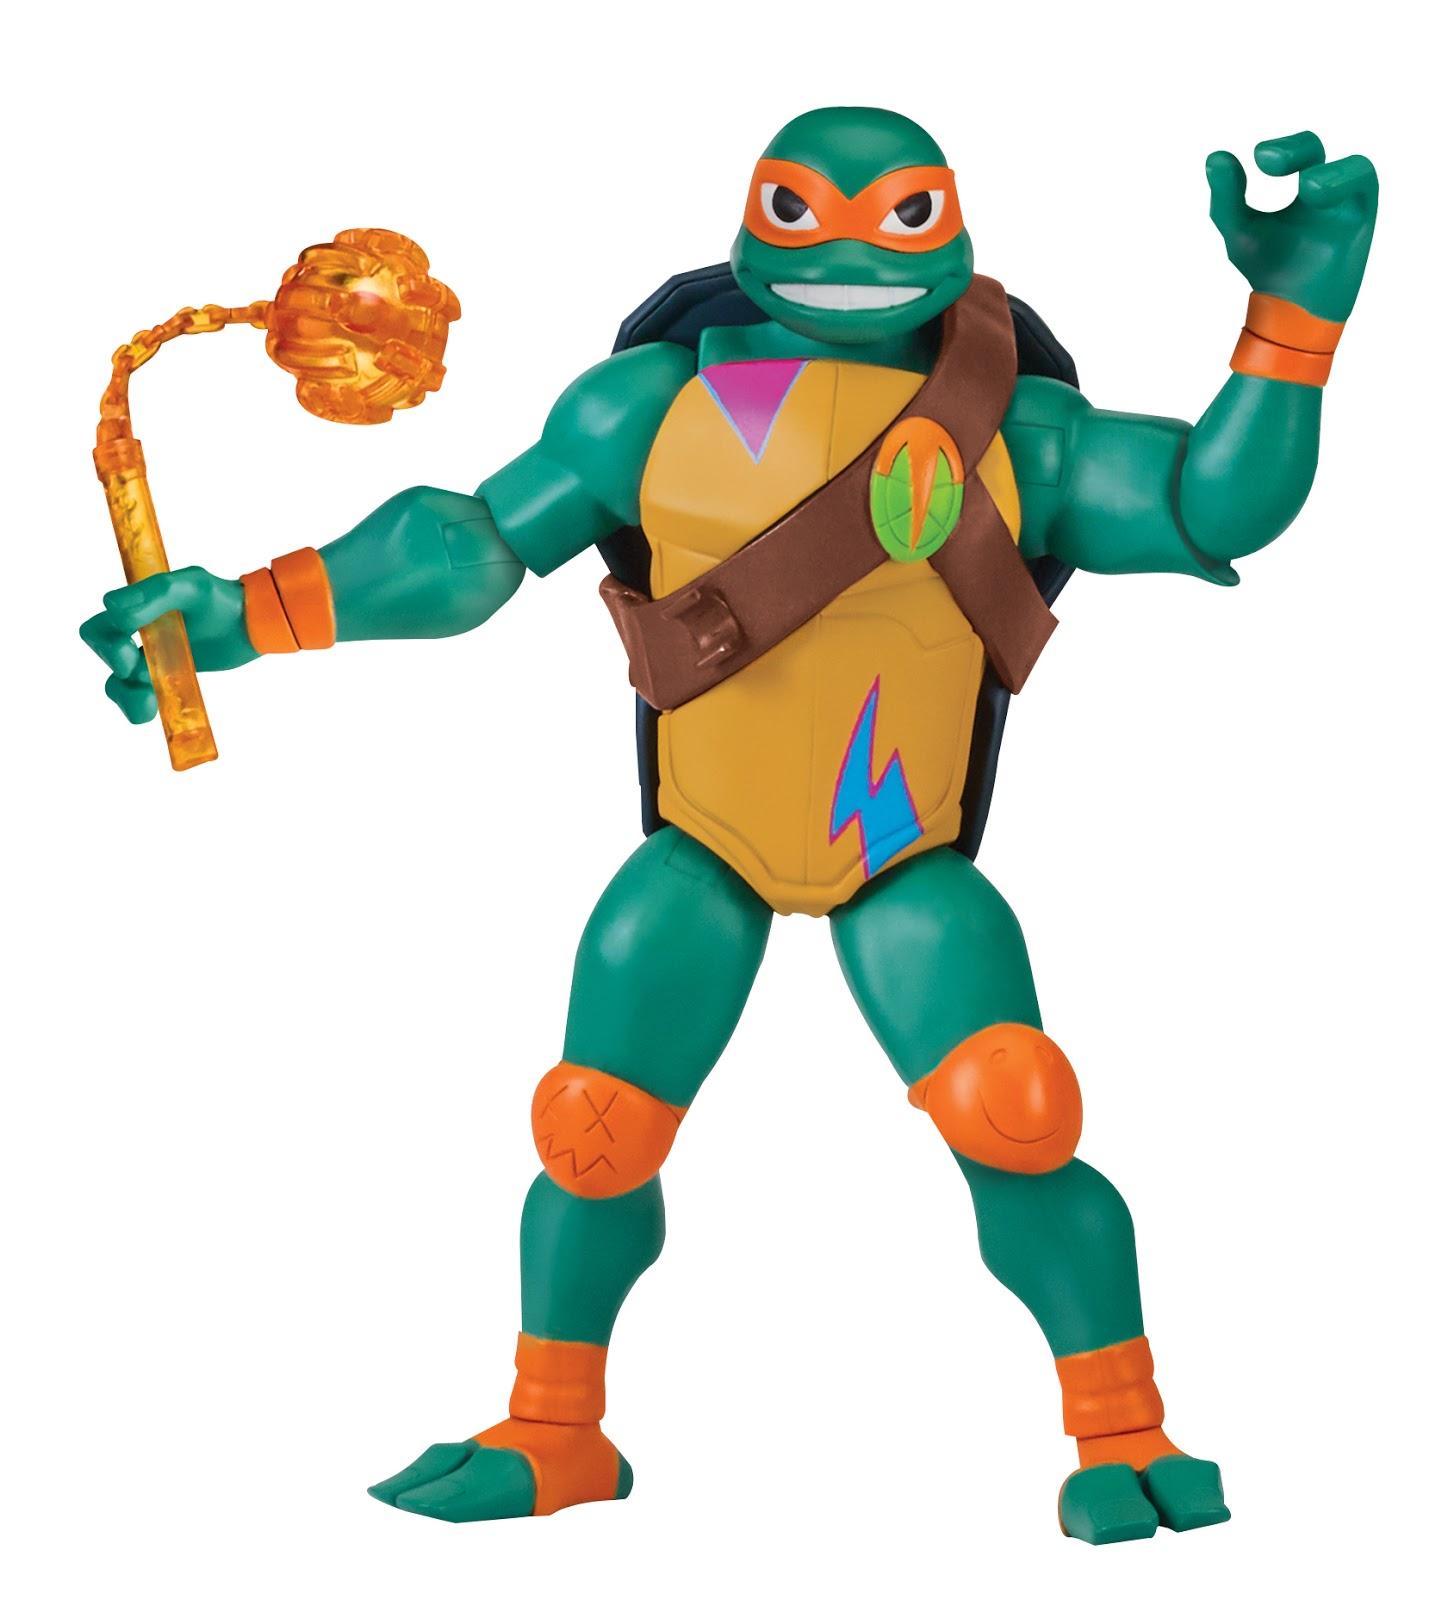 Toys Ninja Turtlw : Nickalive playmates toys to showcase new rise of the